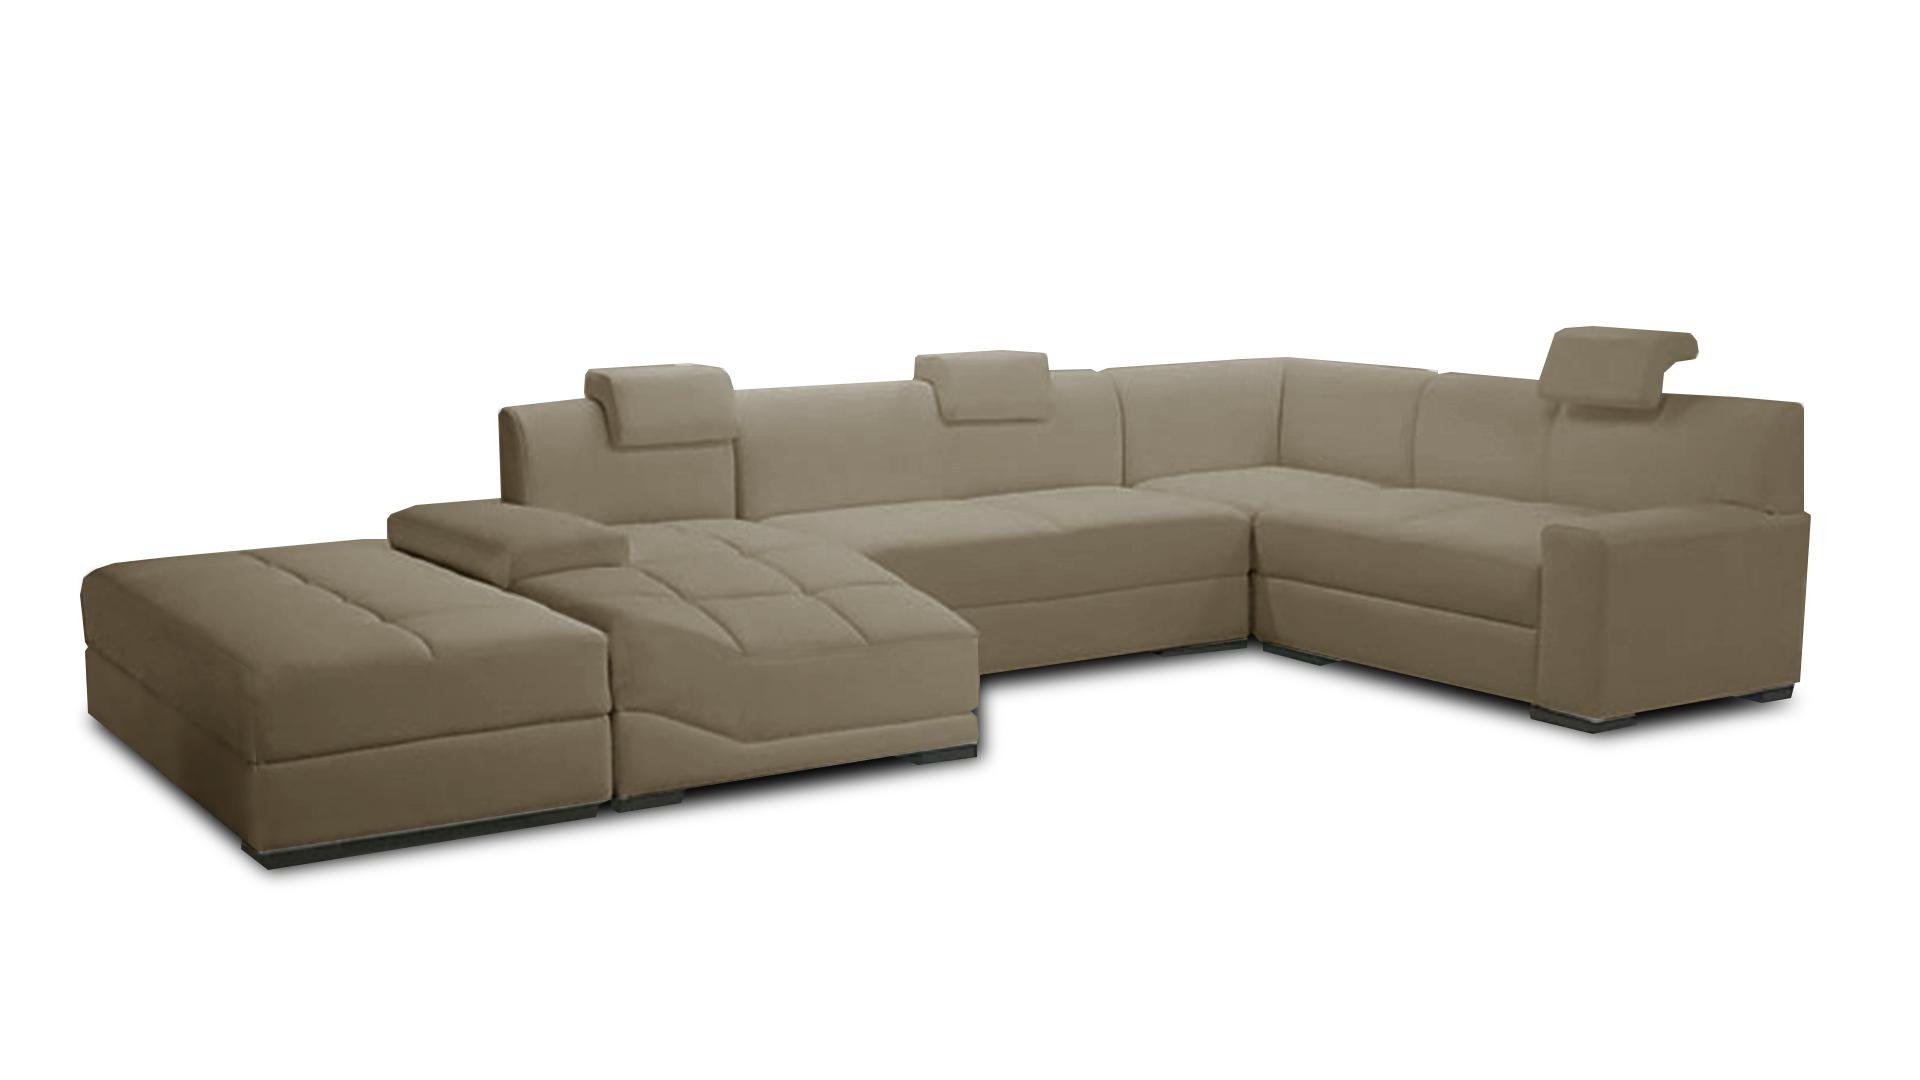 le blog mobiliermoss soldes d hiver 2016. Black Bedroom Furniture Sets. Home Design Ideas